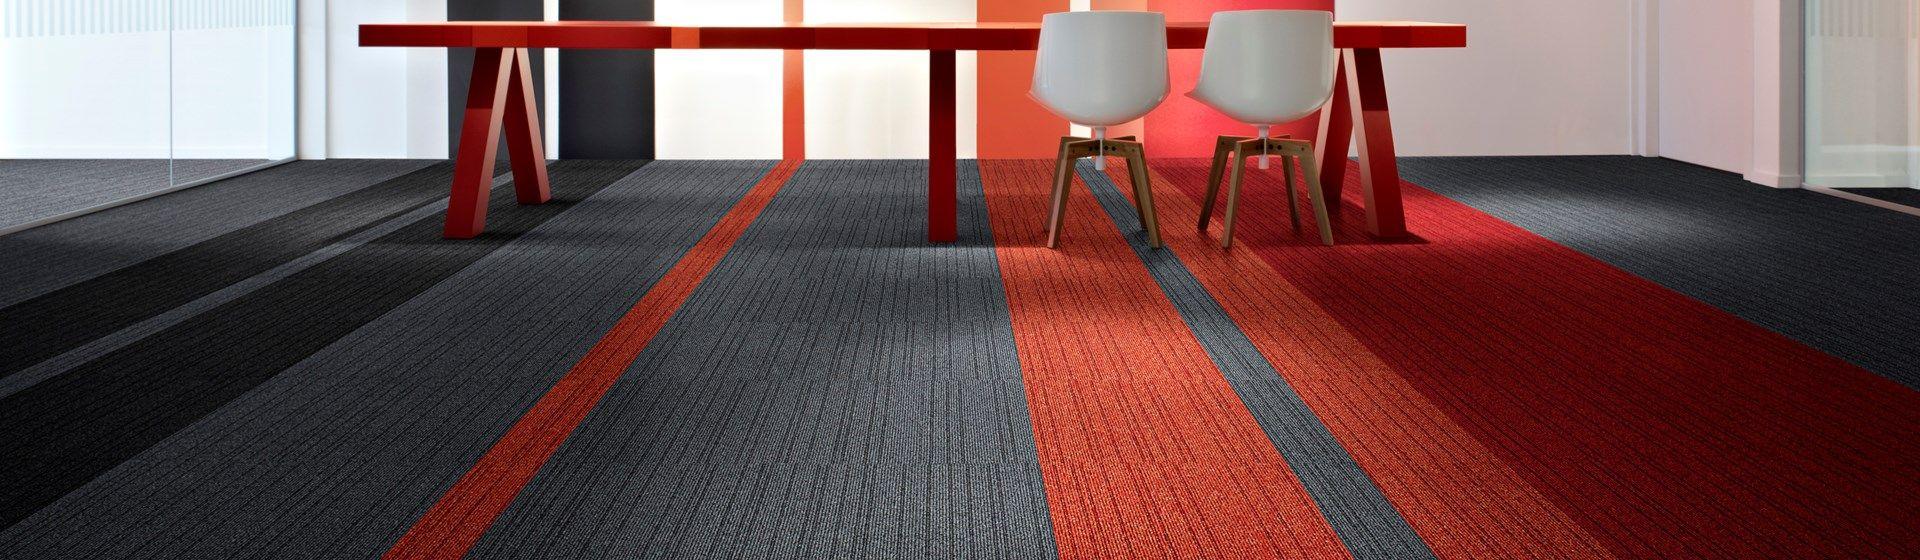 Commercial Grade Carpet Tiles Carpet Tiles